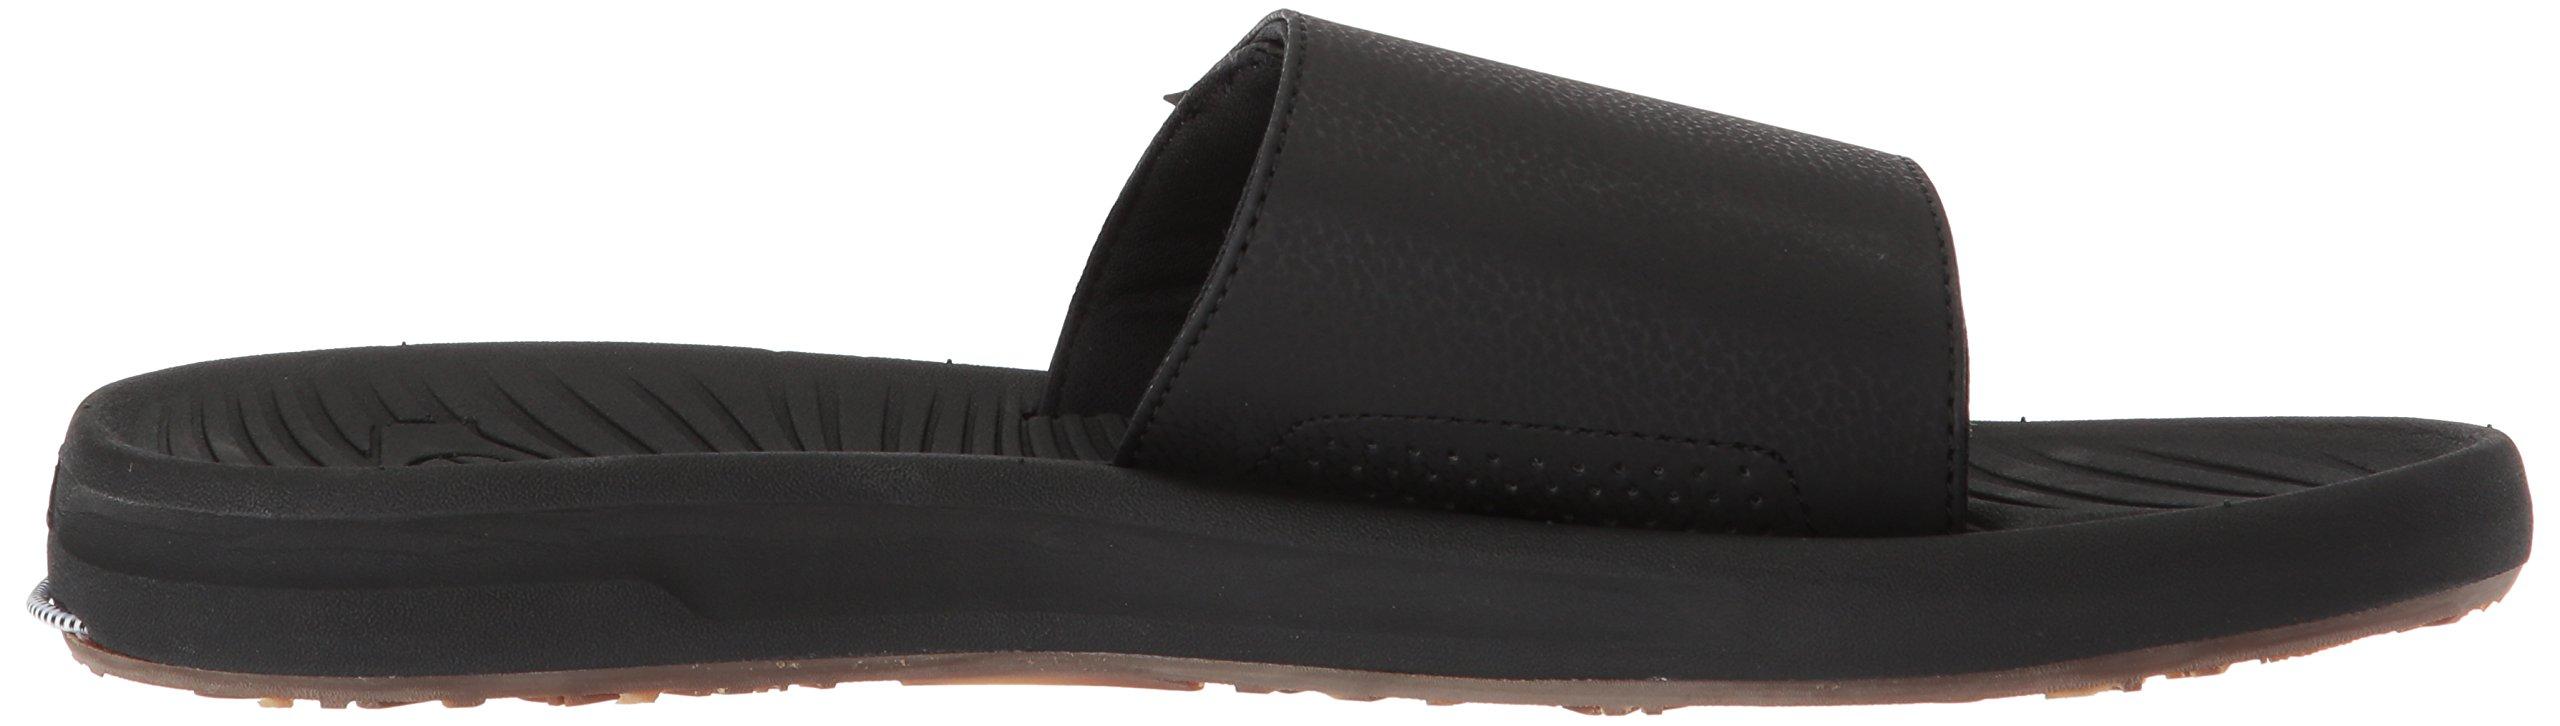 Quiksilver Men's Travel Oasis Slide Sandal, Black/Black/Brown, 8(41) M US by Quiksilver (Image #6)